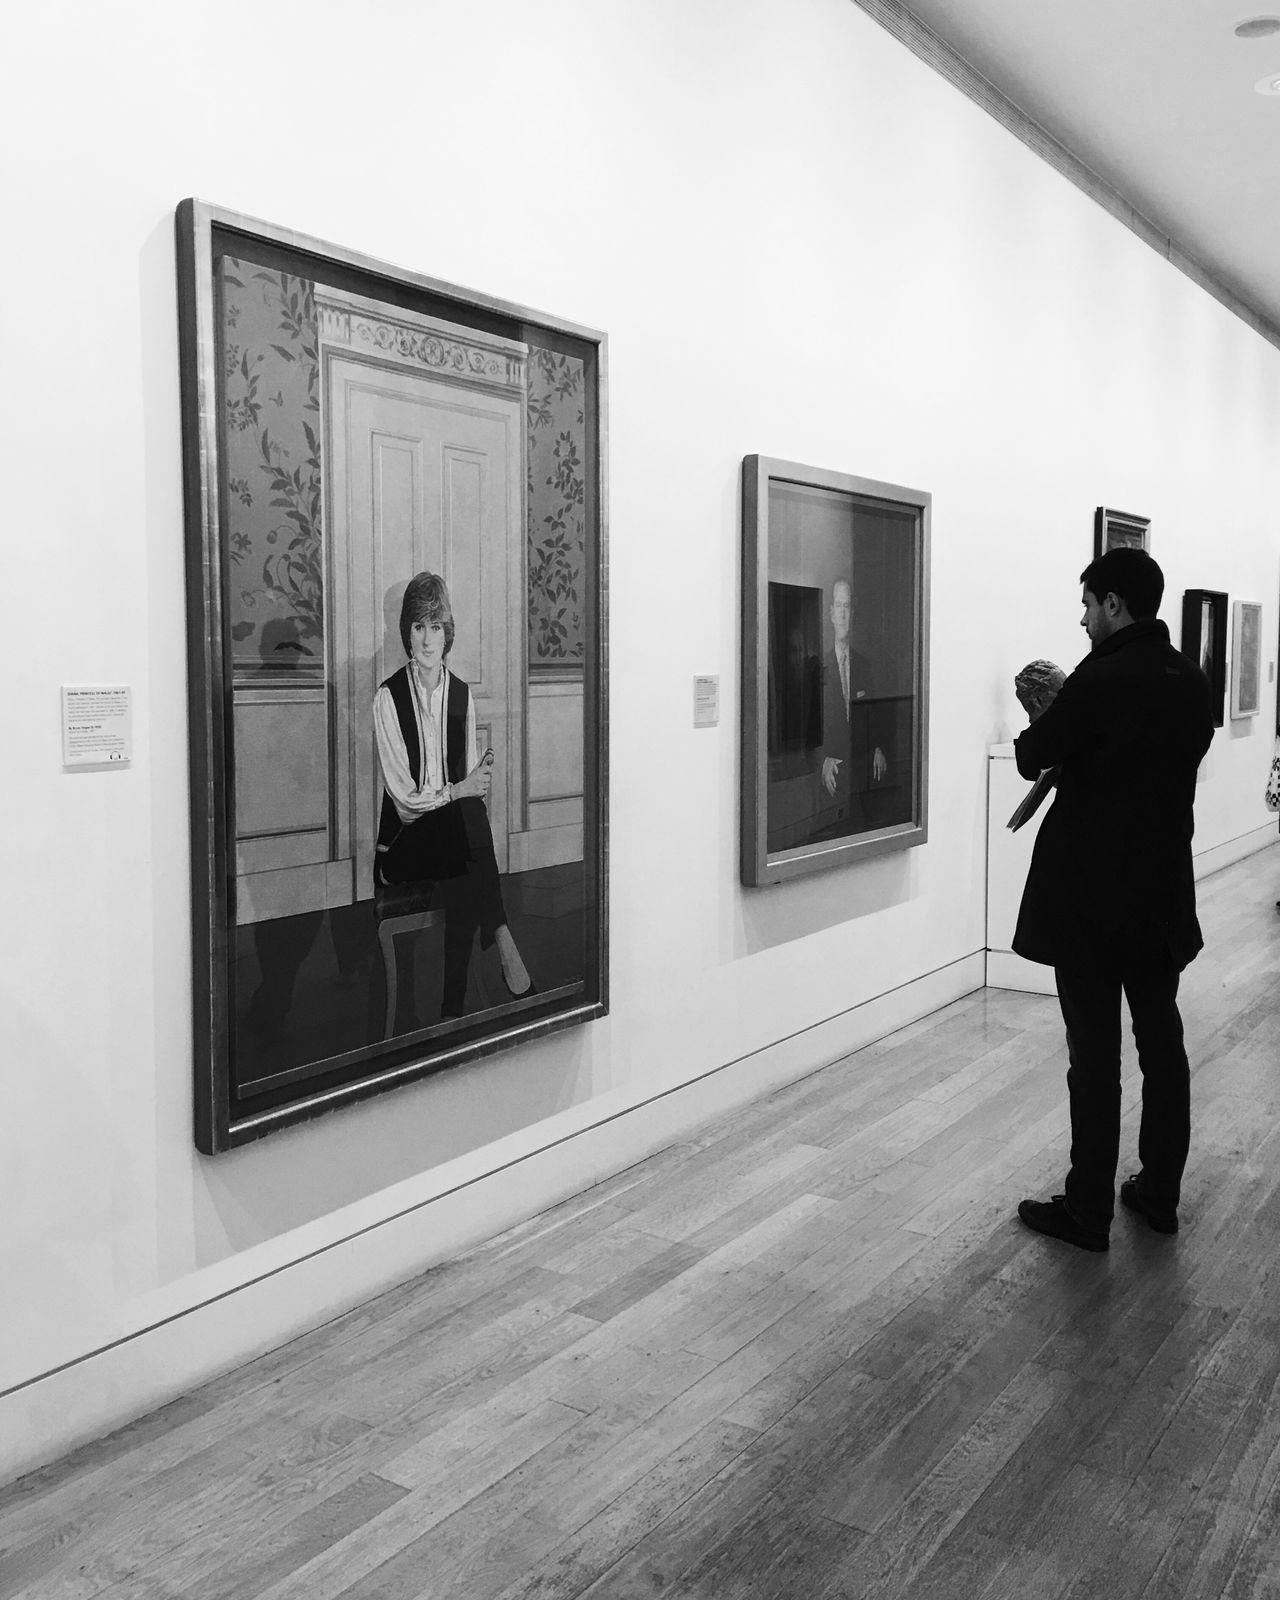 Diana Showcase April Monochrome Blackandwhite VSCO Iphonesia Iphonephotography IPhoneography